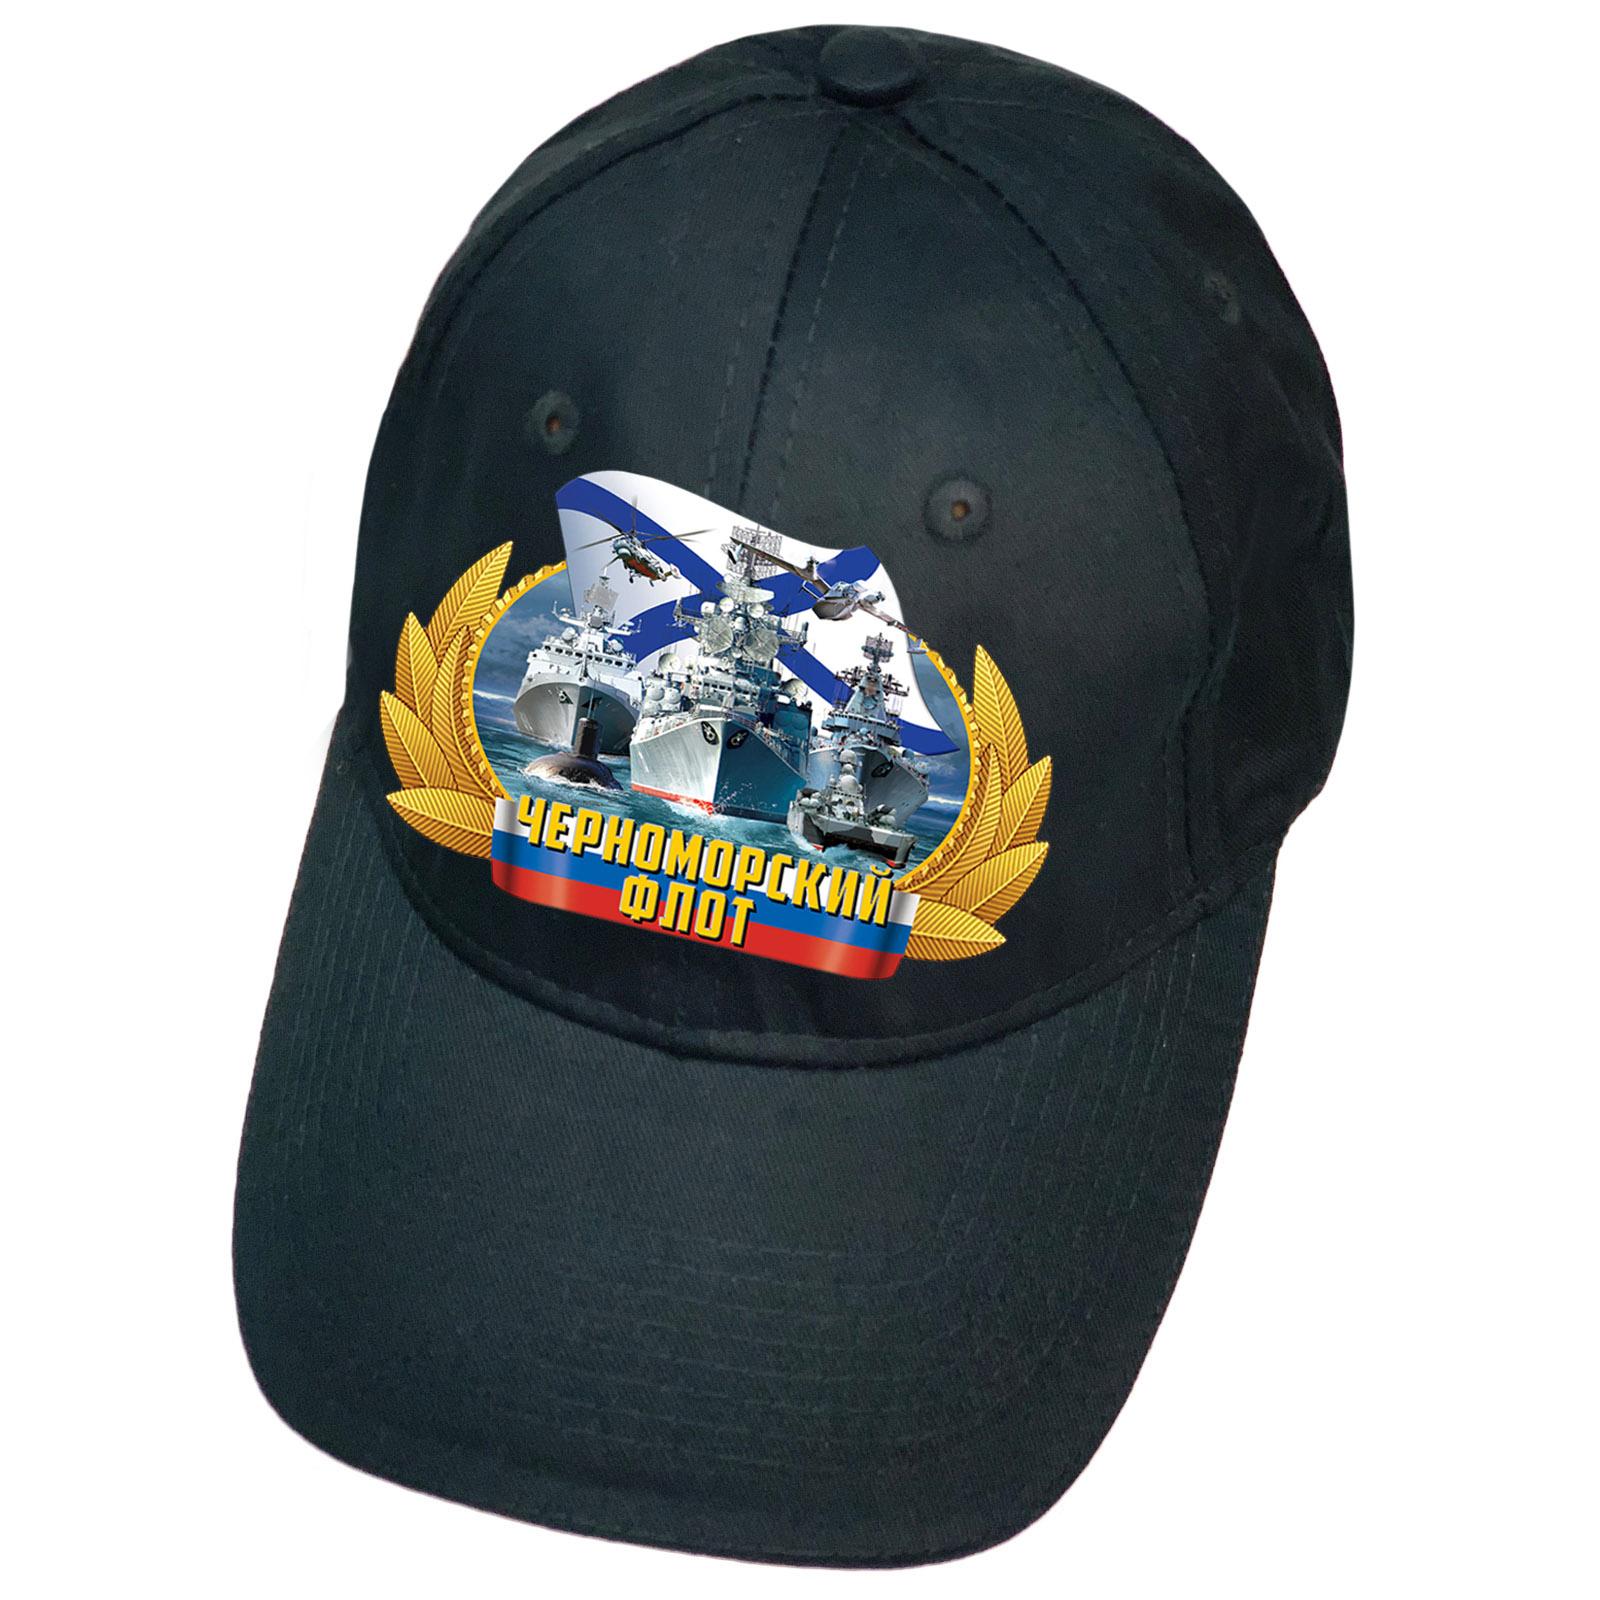 Тёмно-синяя кепка с термотрансфером Черноморский флот